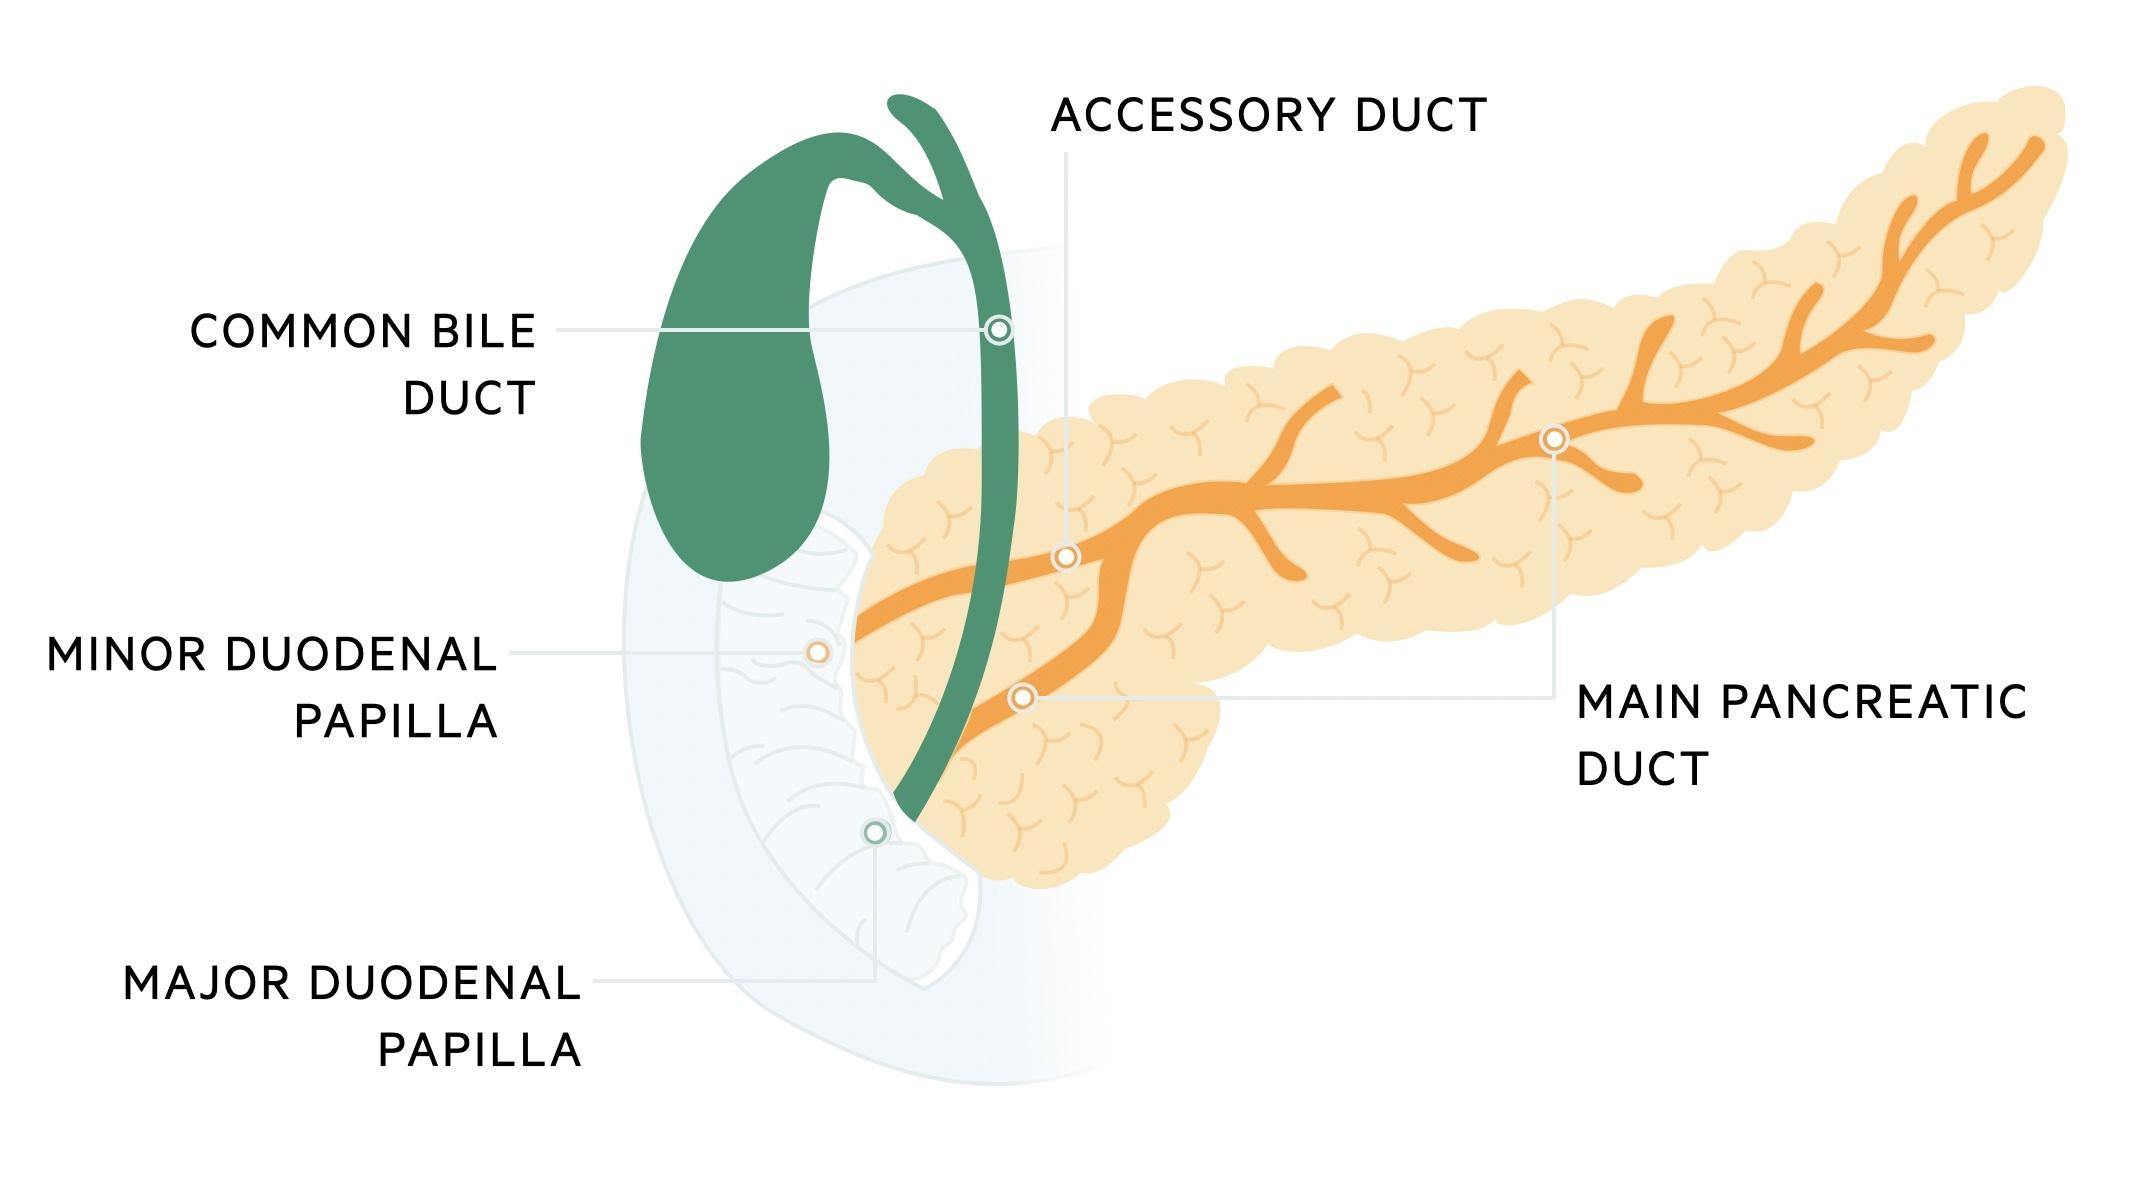 Pancreas ductal anatomy